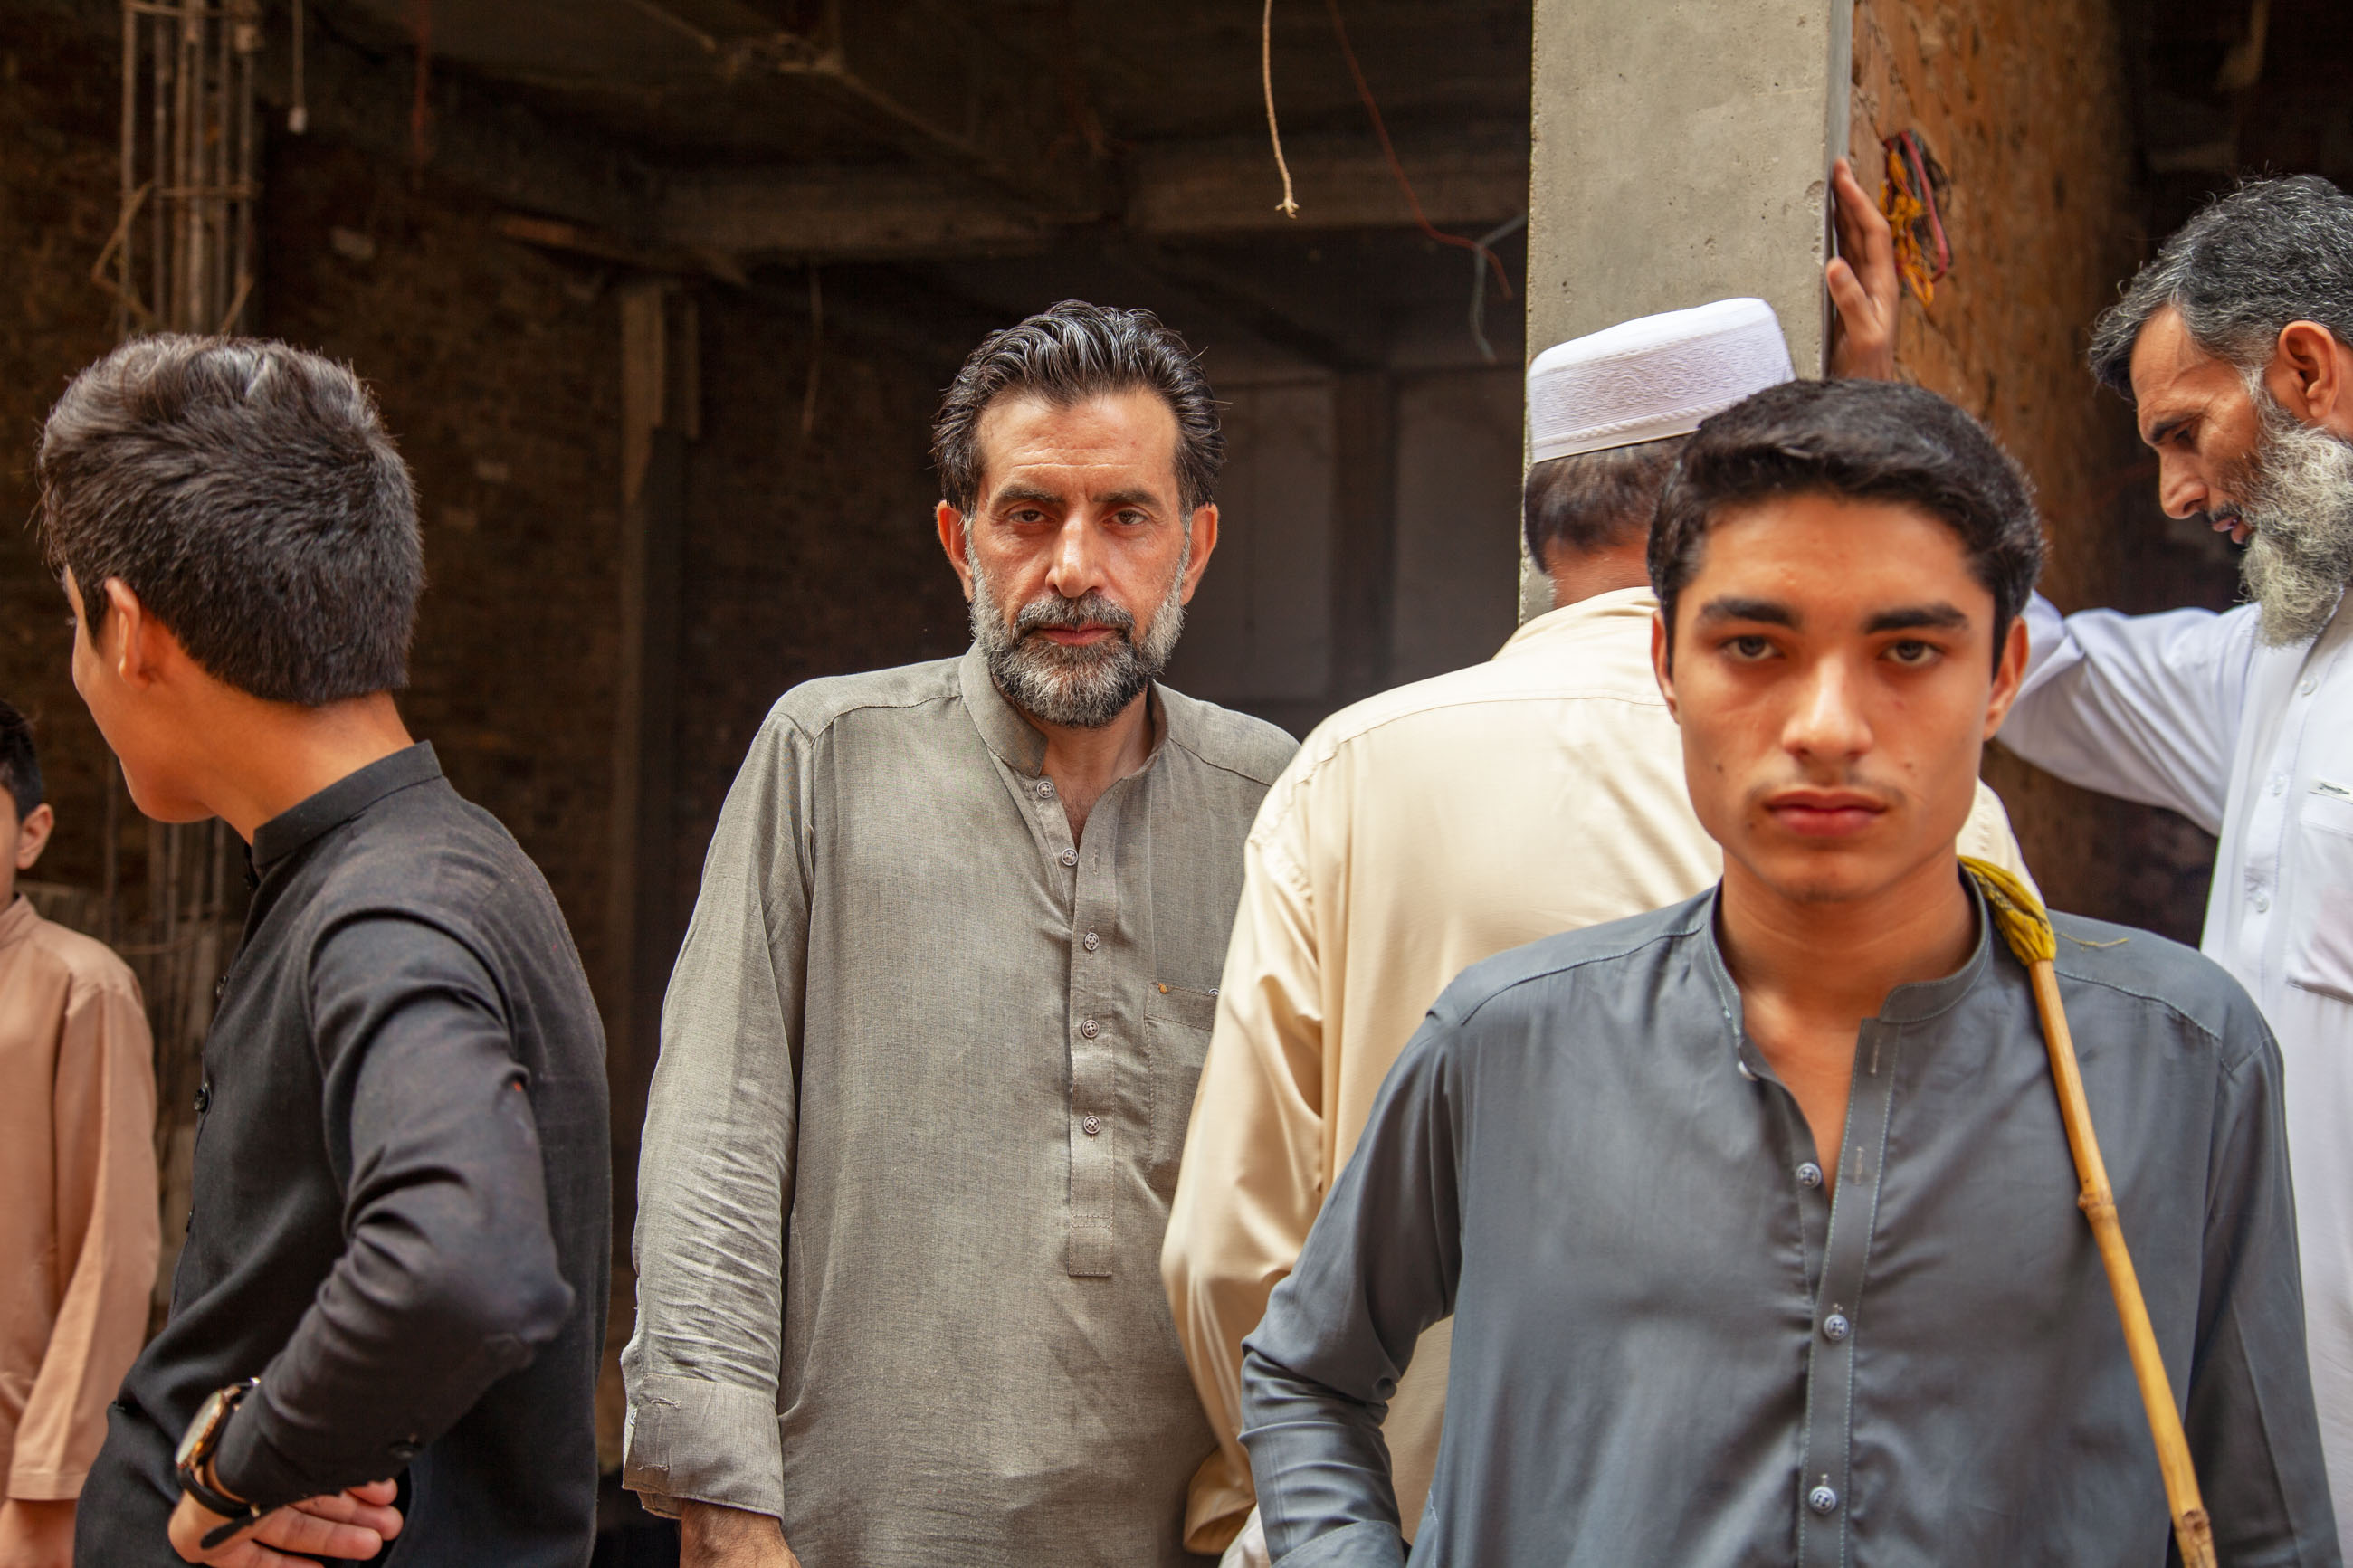 https://bubo.sk/uploads/galleries/4920/samuelklc_pakistan_peshawar_lahore_img_0026.jpg